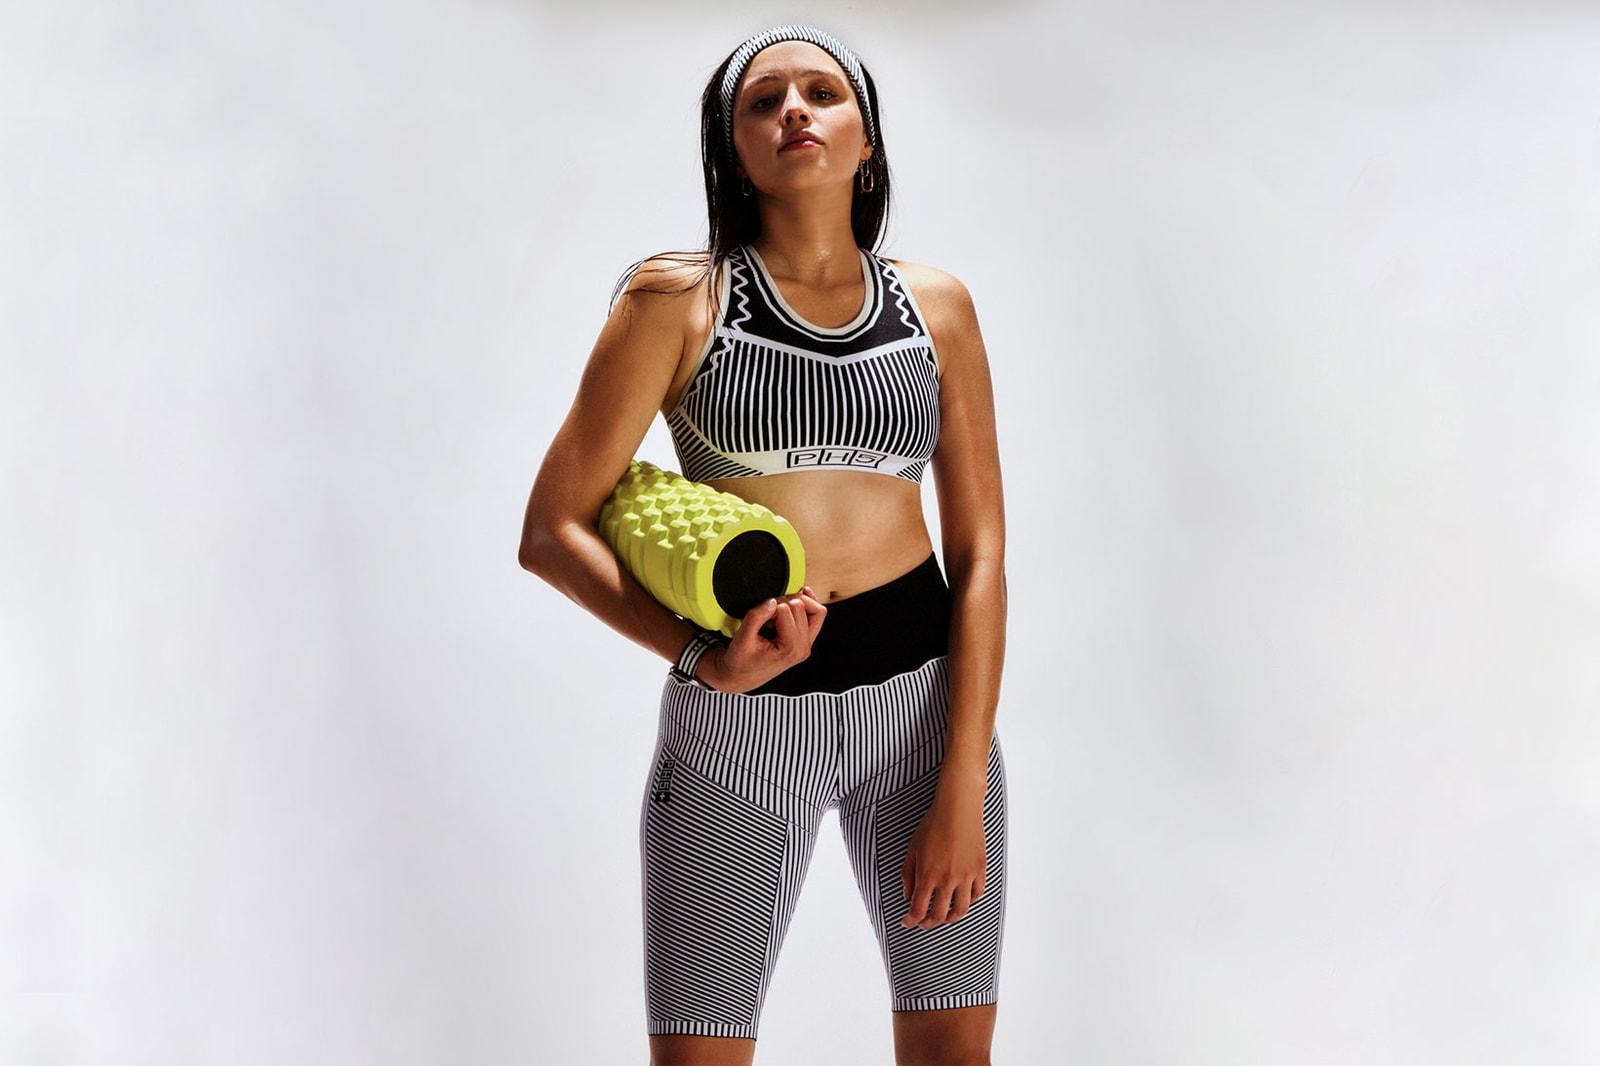 ph5 sustainable activewear line workout gym clothes yoga bridge pose